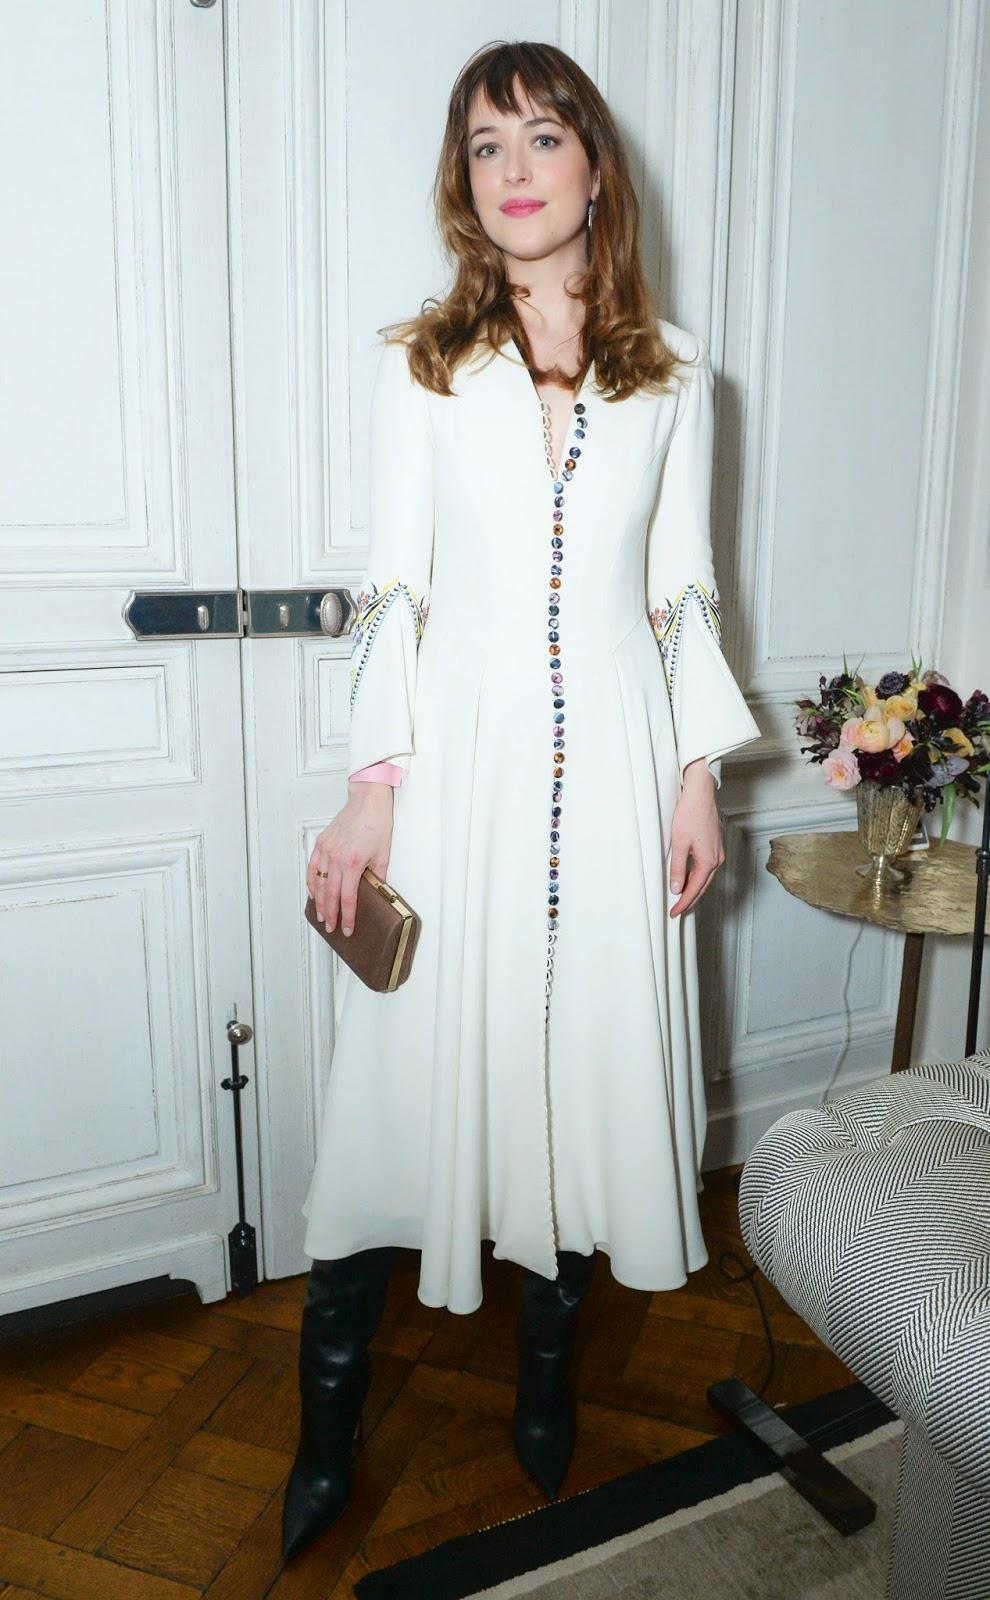 Fashion Model, Actress @ Dakota Johnson - The CFDA/Vogue Fashion Fund